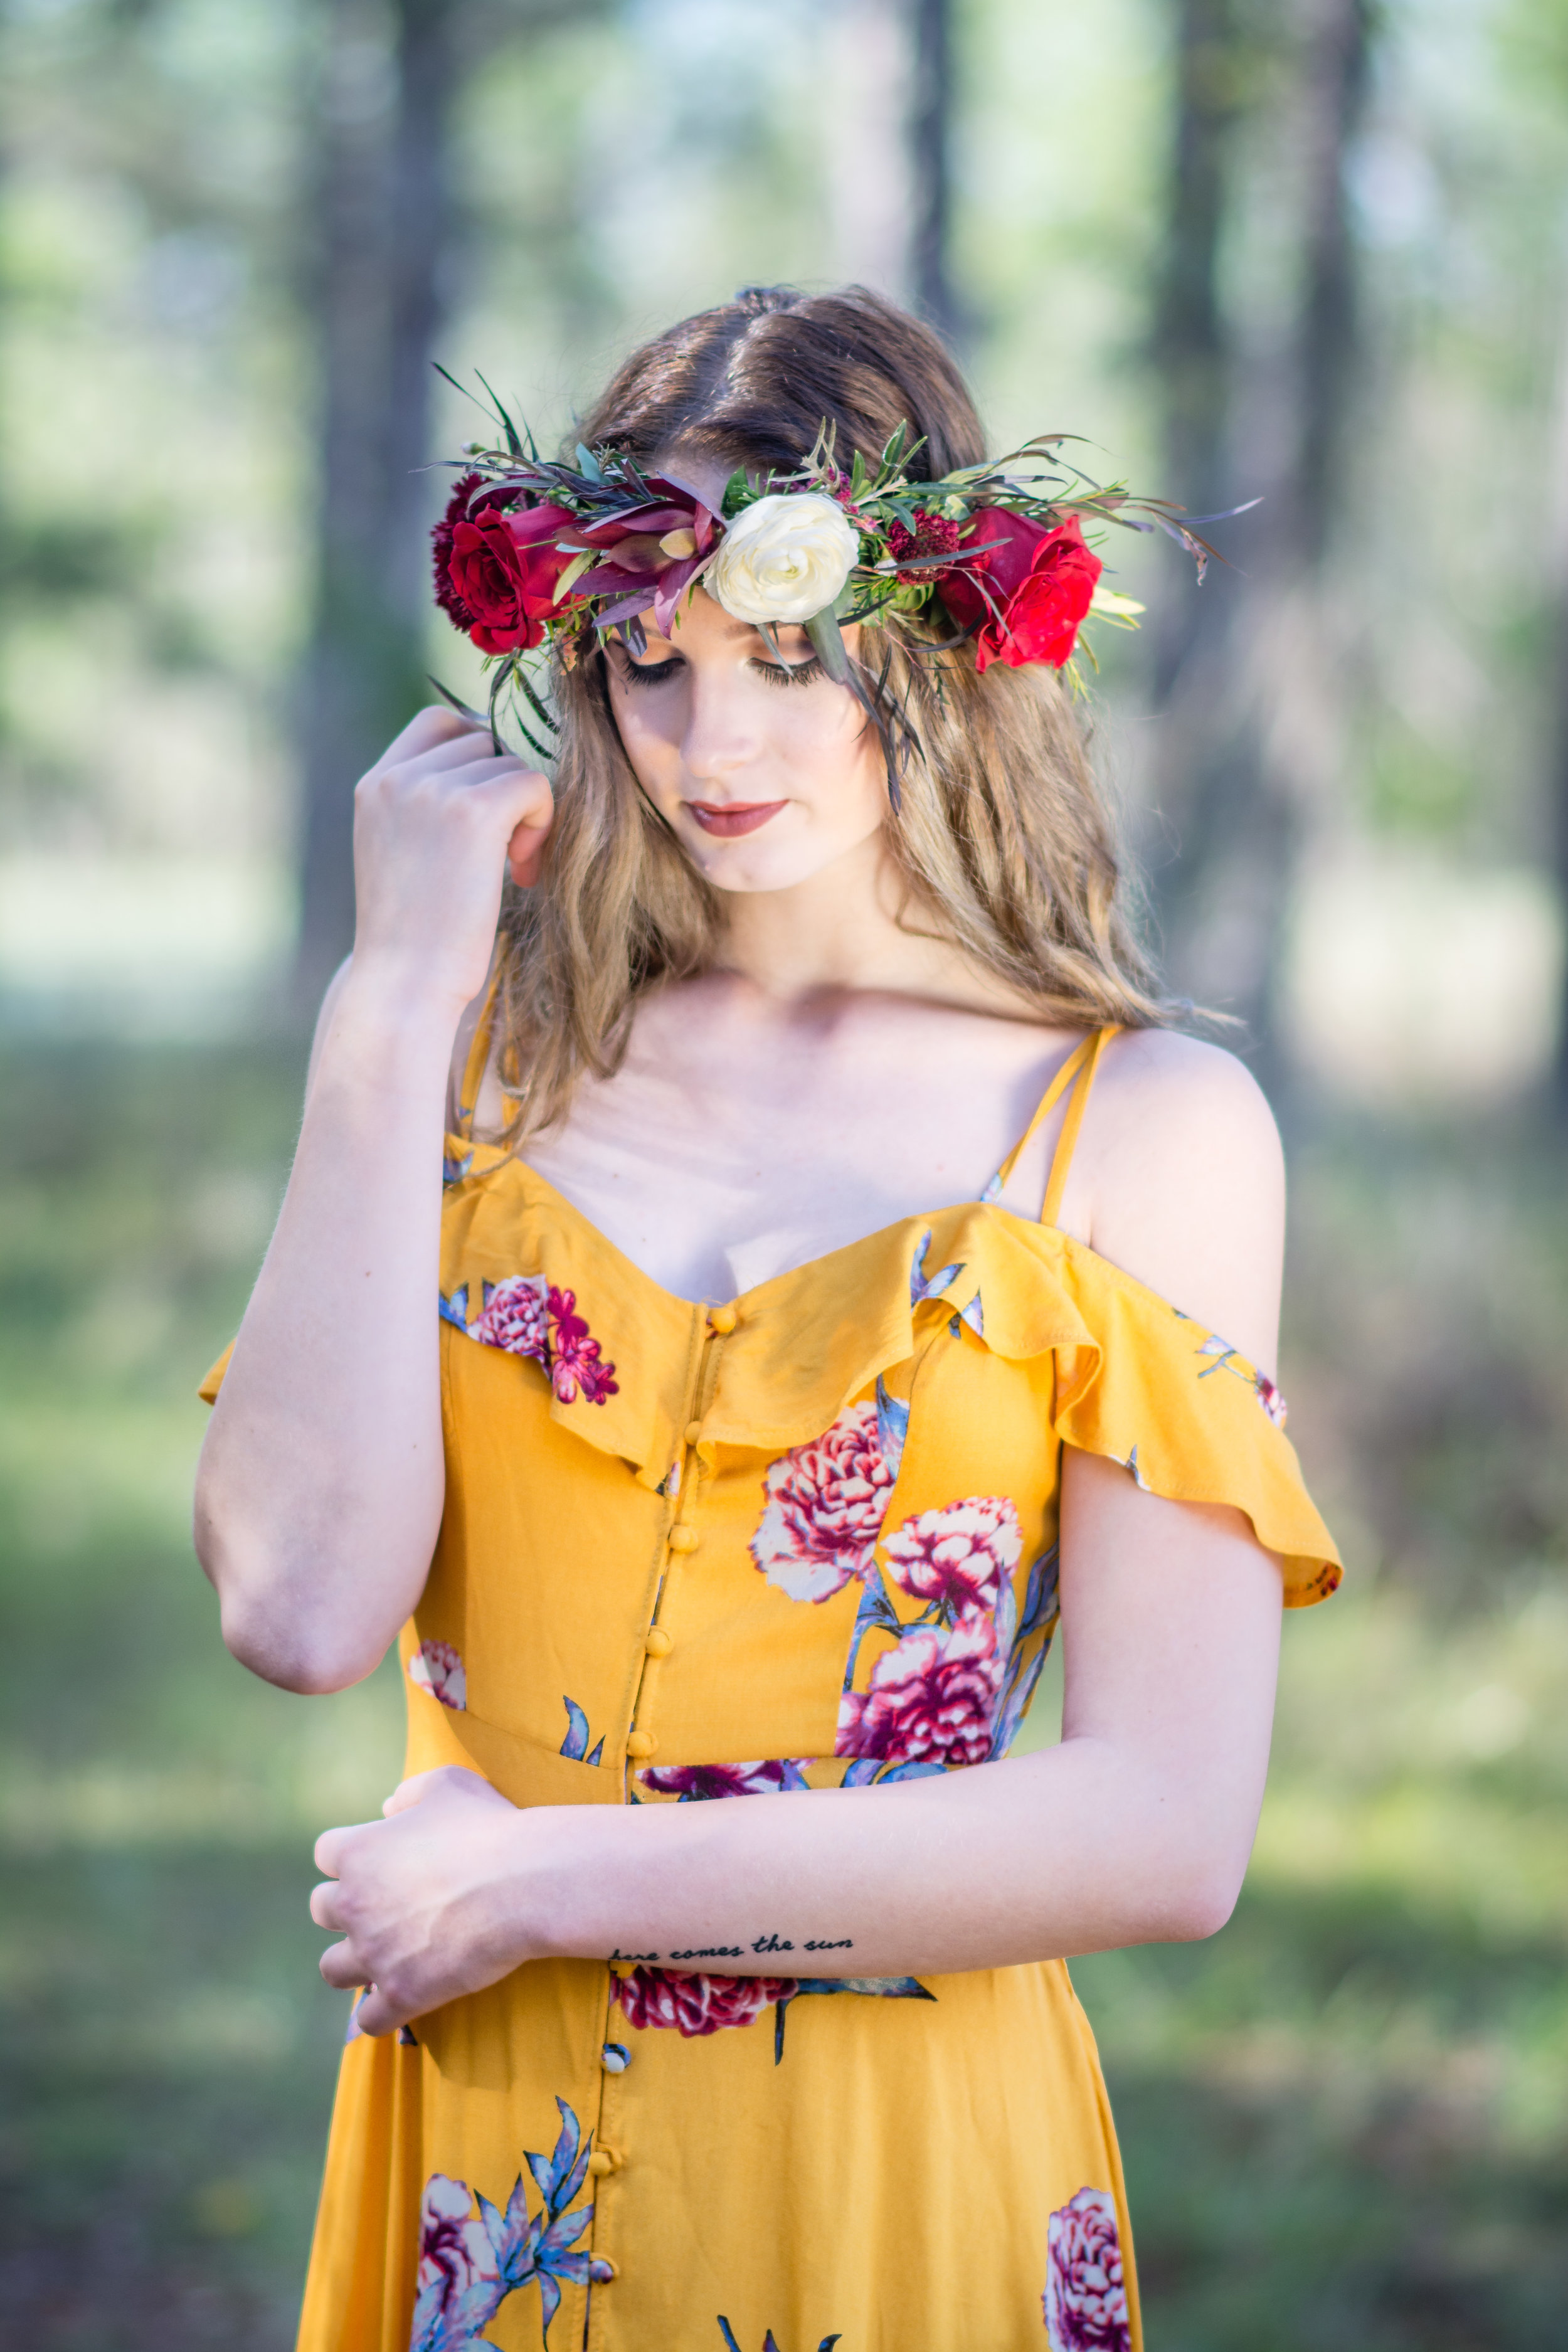 floral-headpiece-fashion-photoshoot-geneva-central-florida-photographer-yanitza-ninett-7.jpg